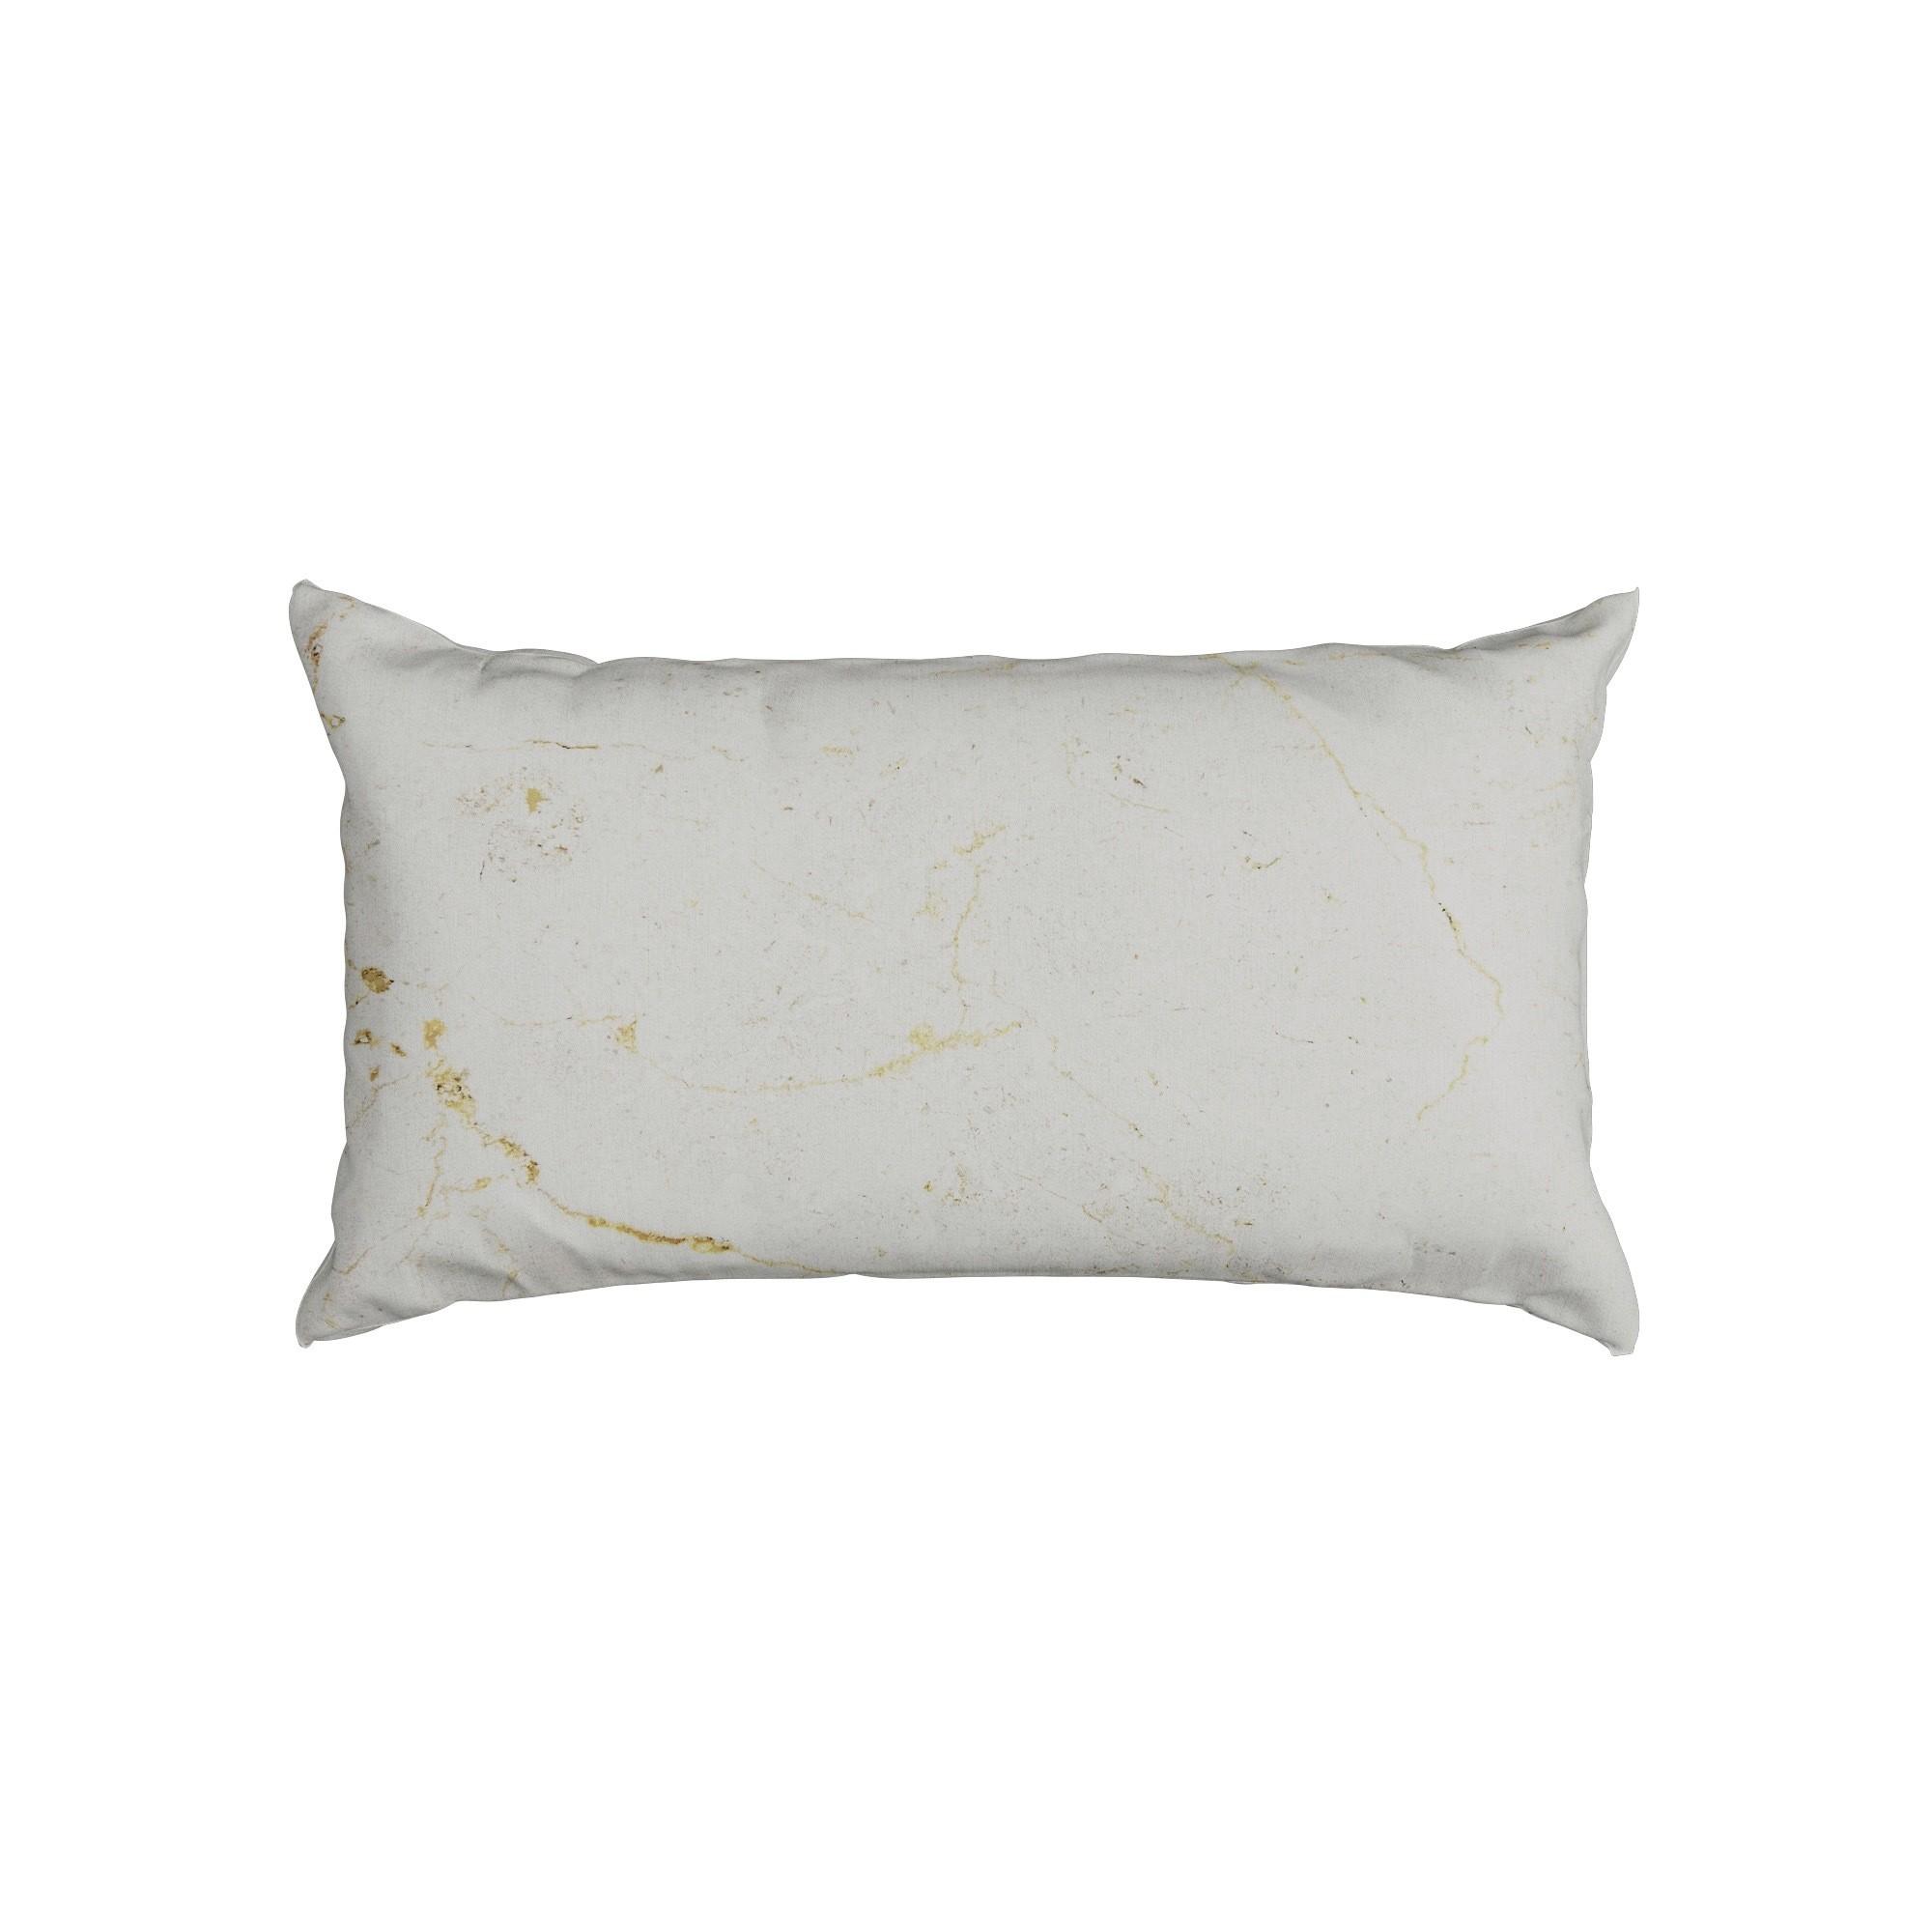 Almofada Silk Home 28x48cm 0467 - Belchior